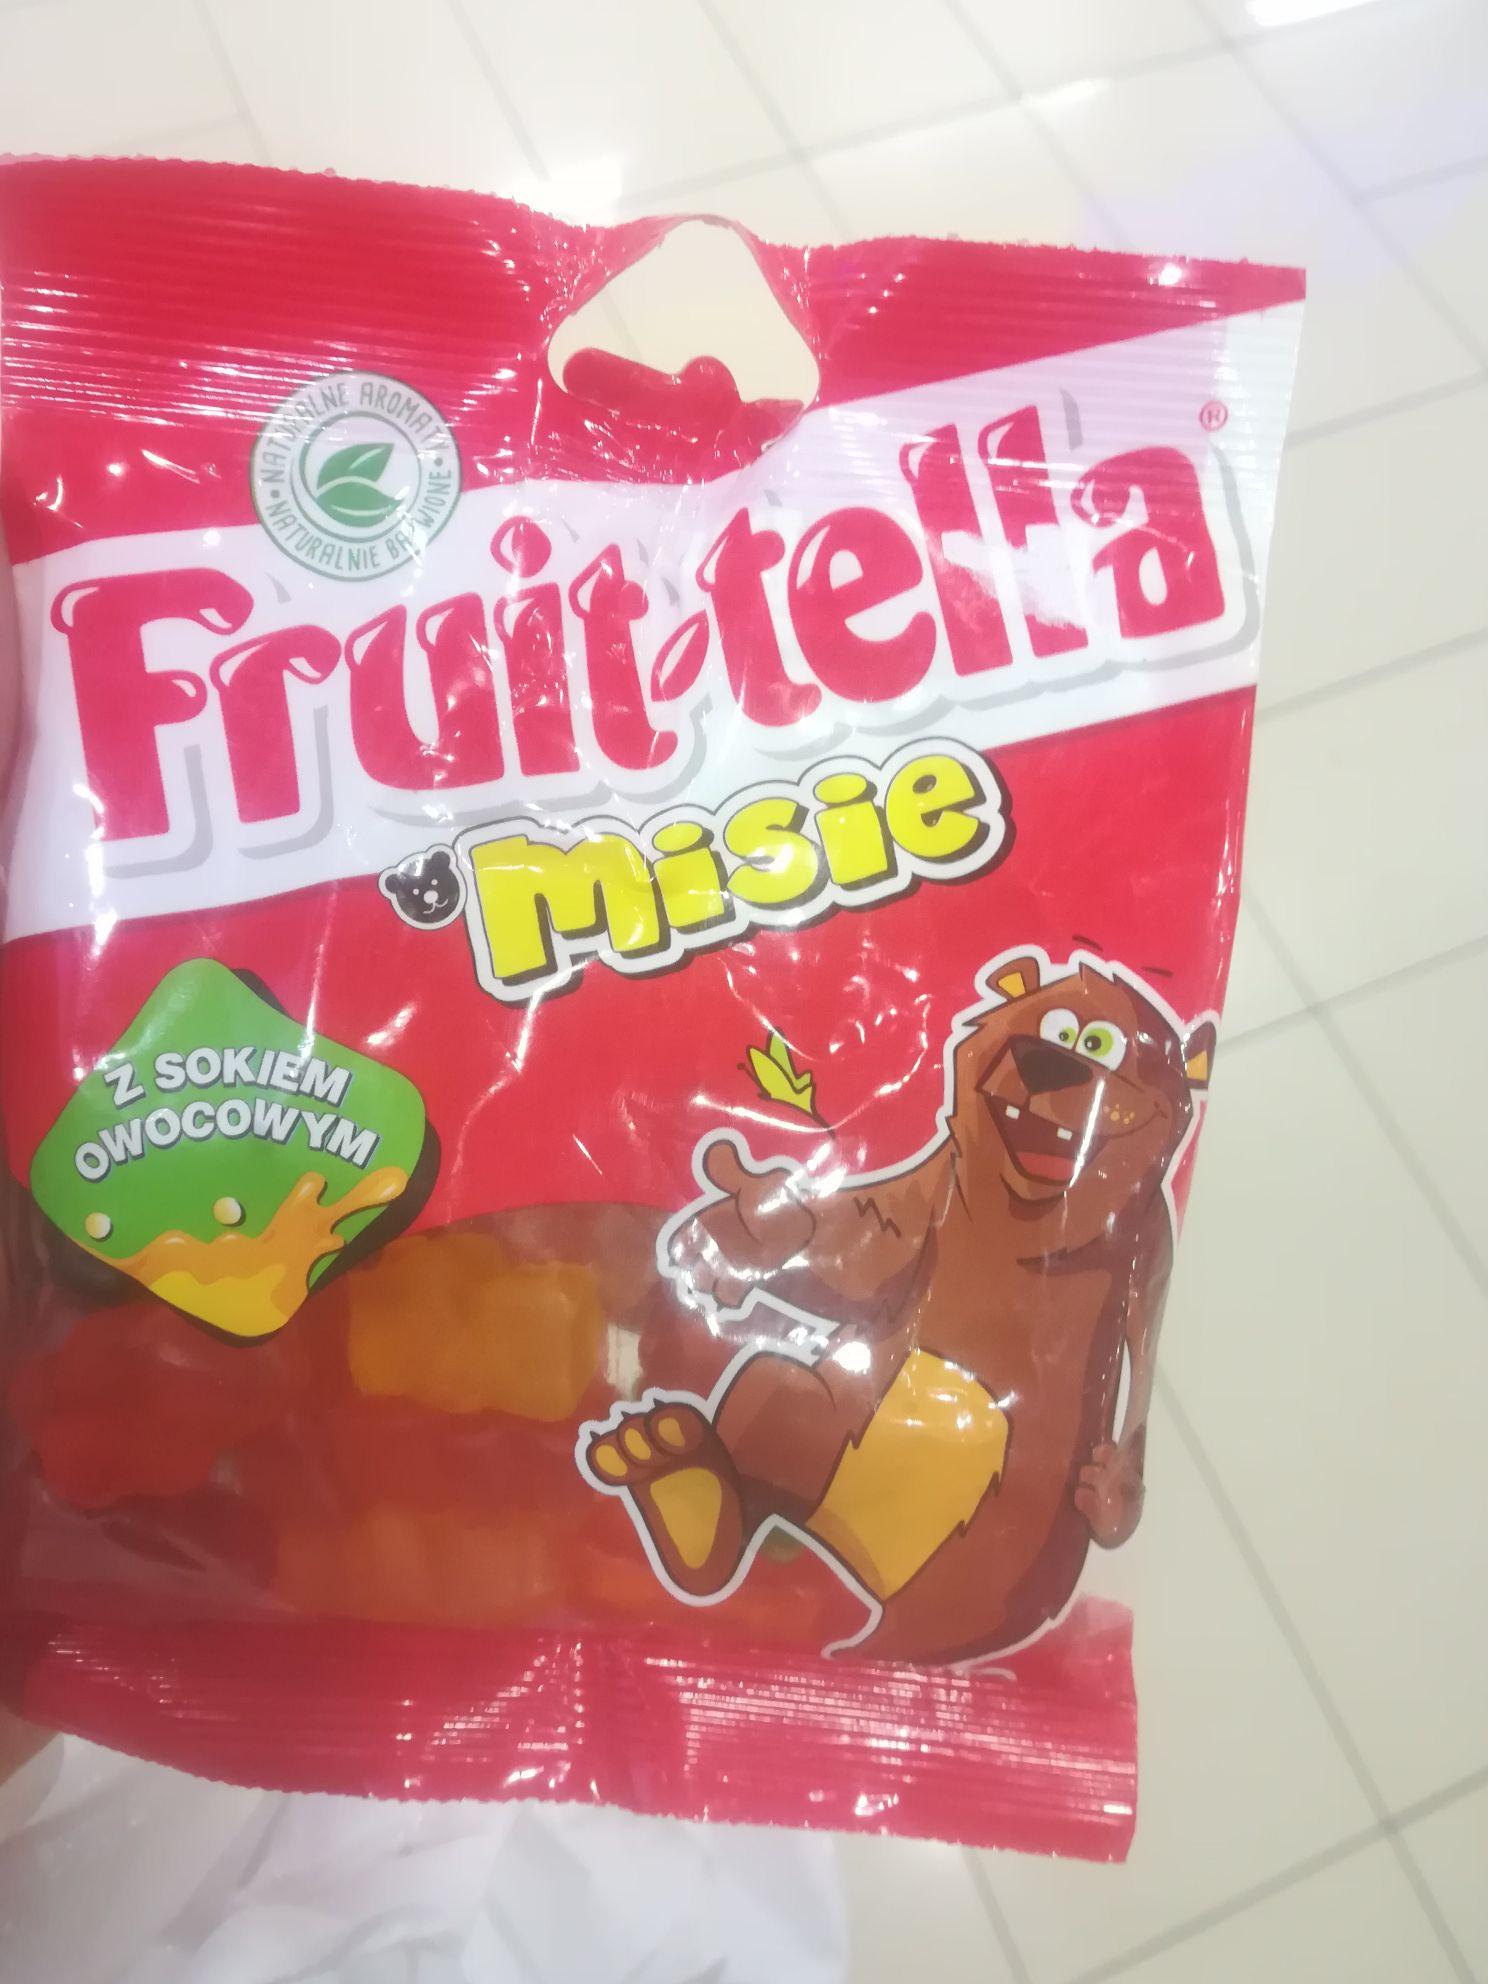 Fruit-tella misie żelki za 40 groszy Empik